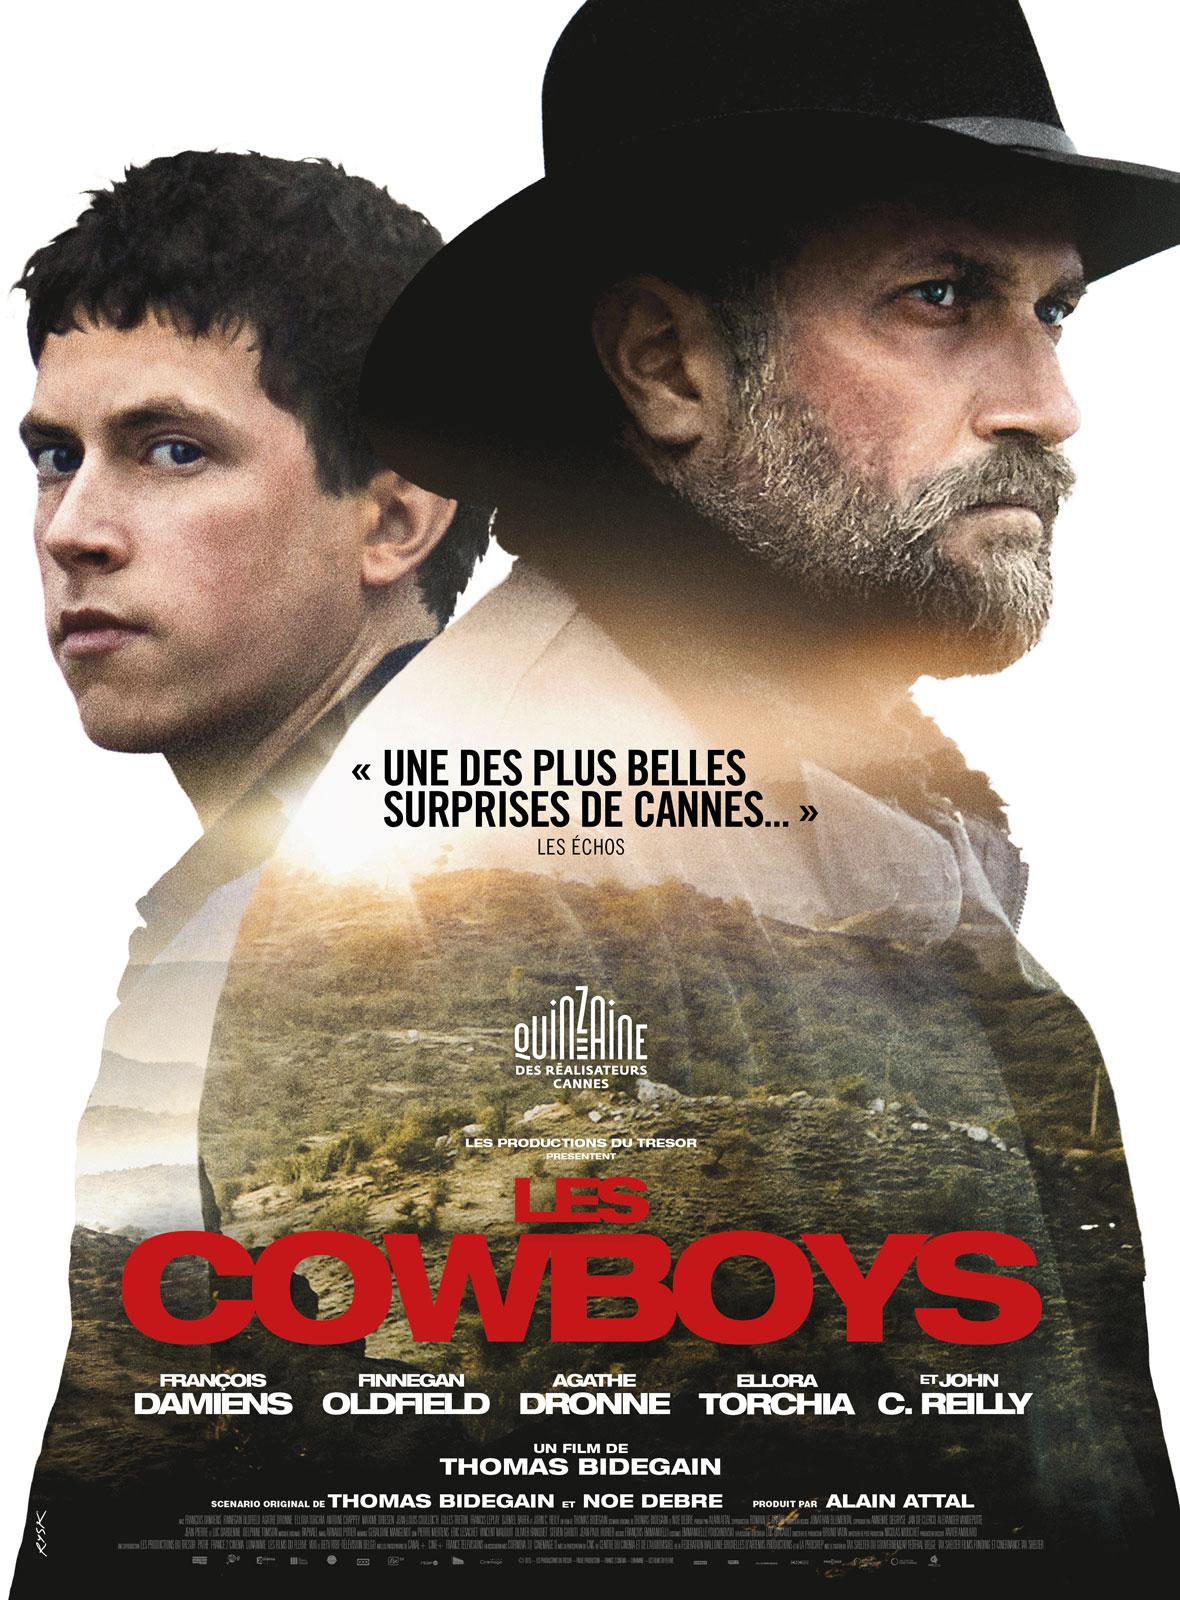 critique les cowboys